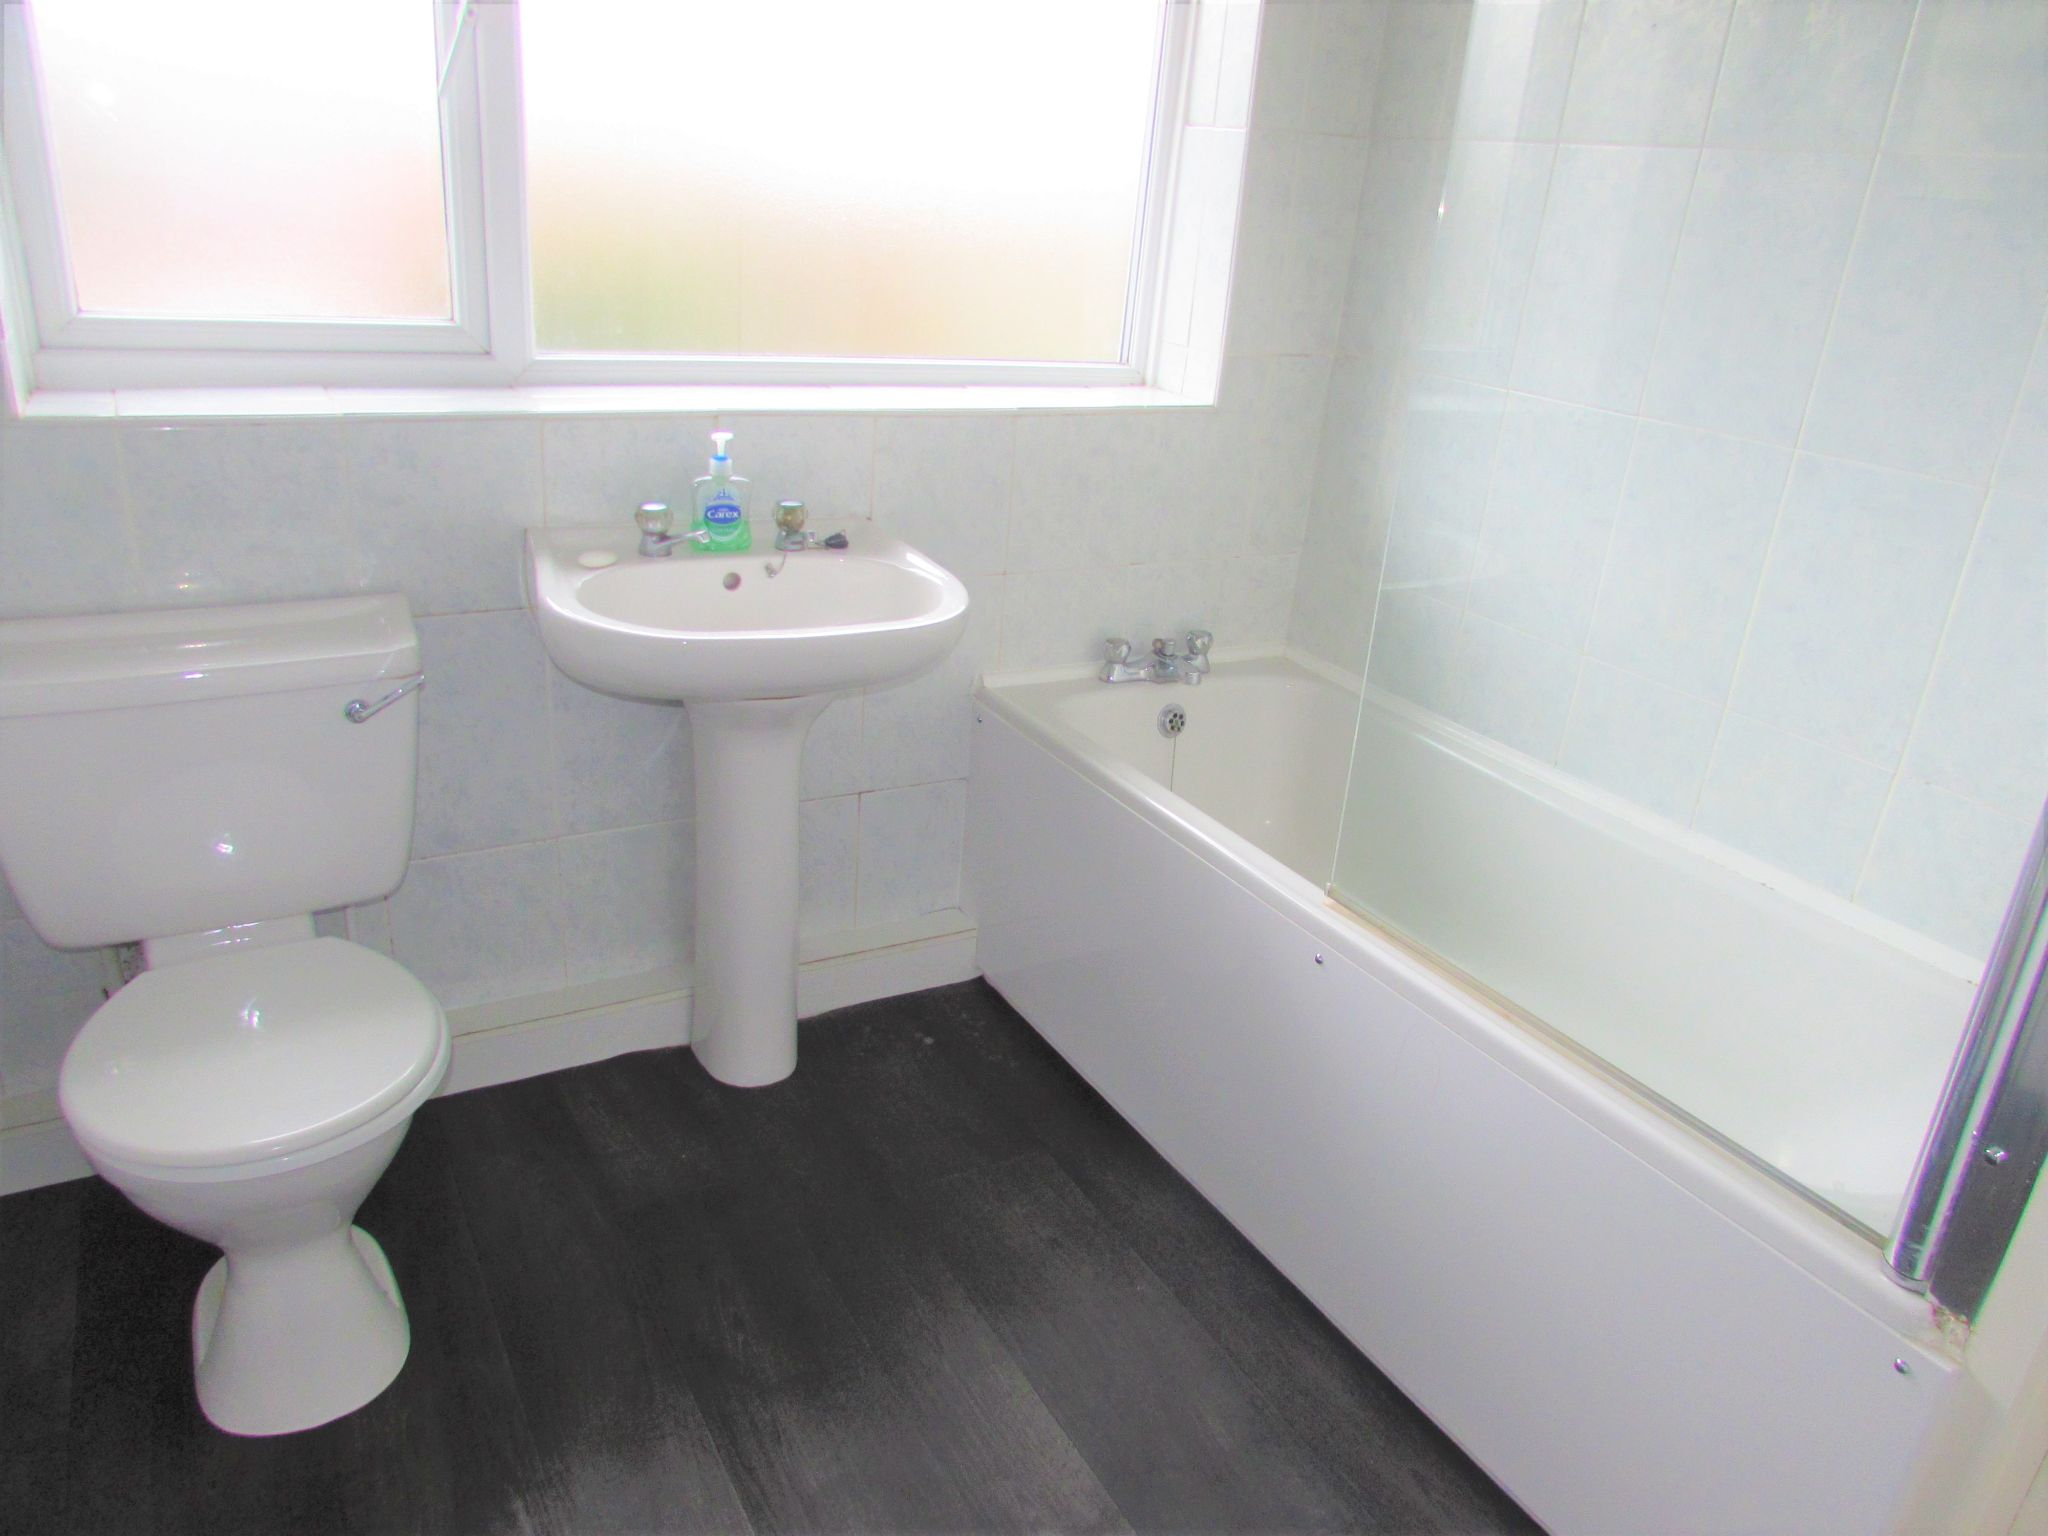 2 Bedroom Duplex Flat/apartment To Rent - Bathroom